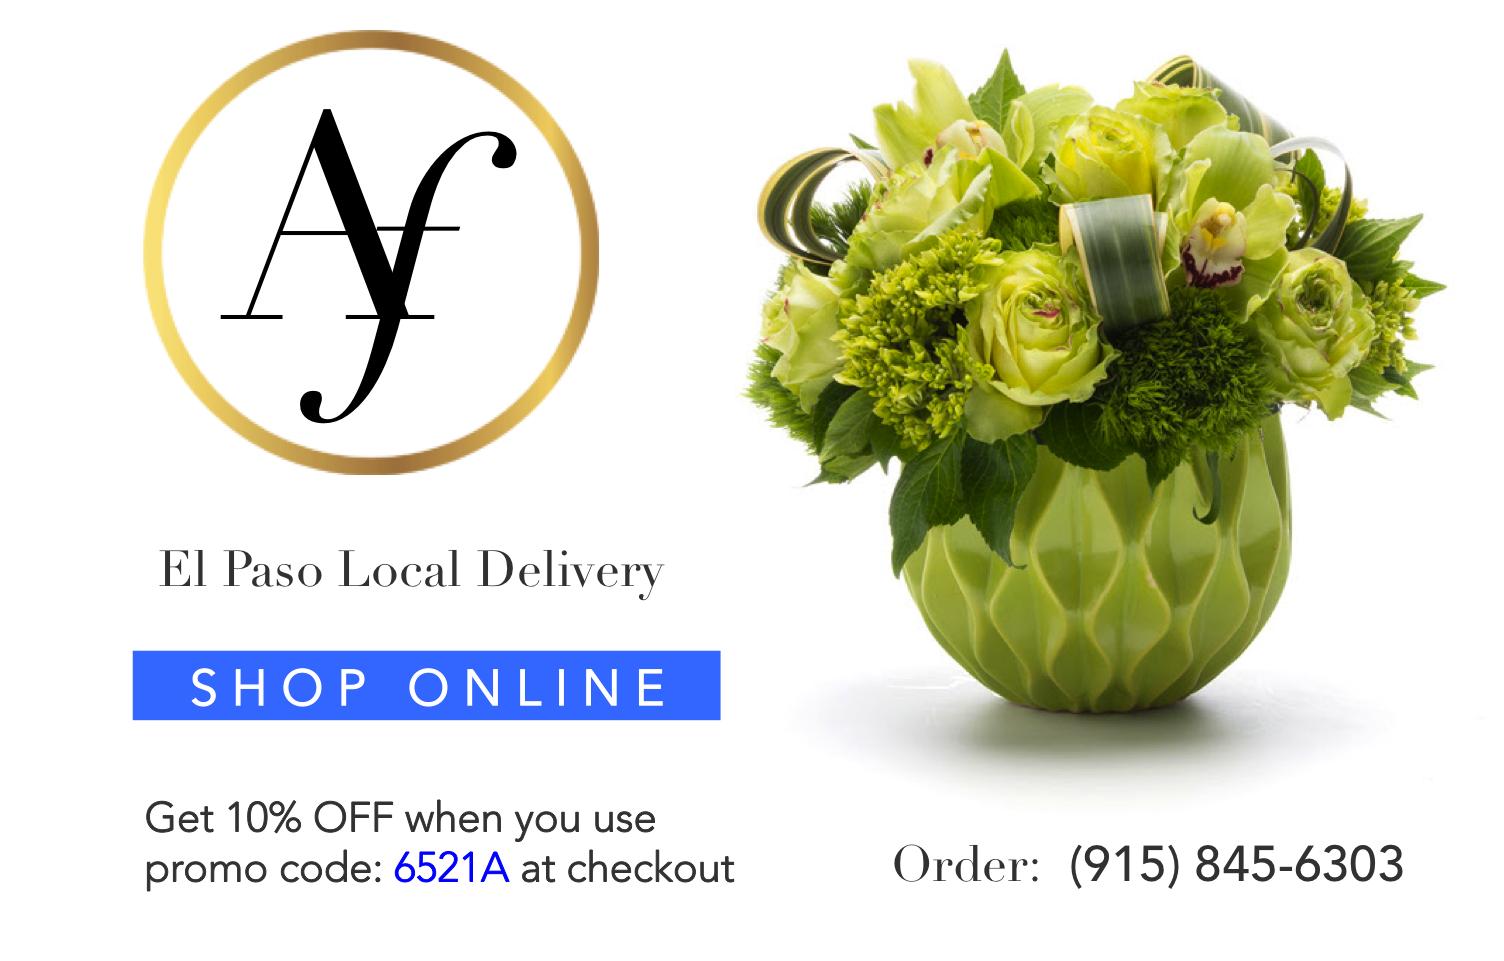 79912-angies-3-floral-designs-el-paso-florist-79912.png